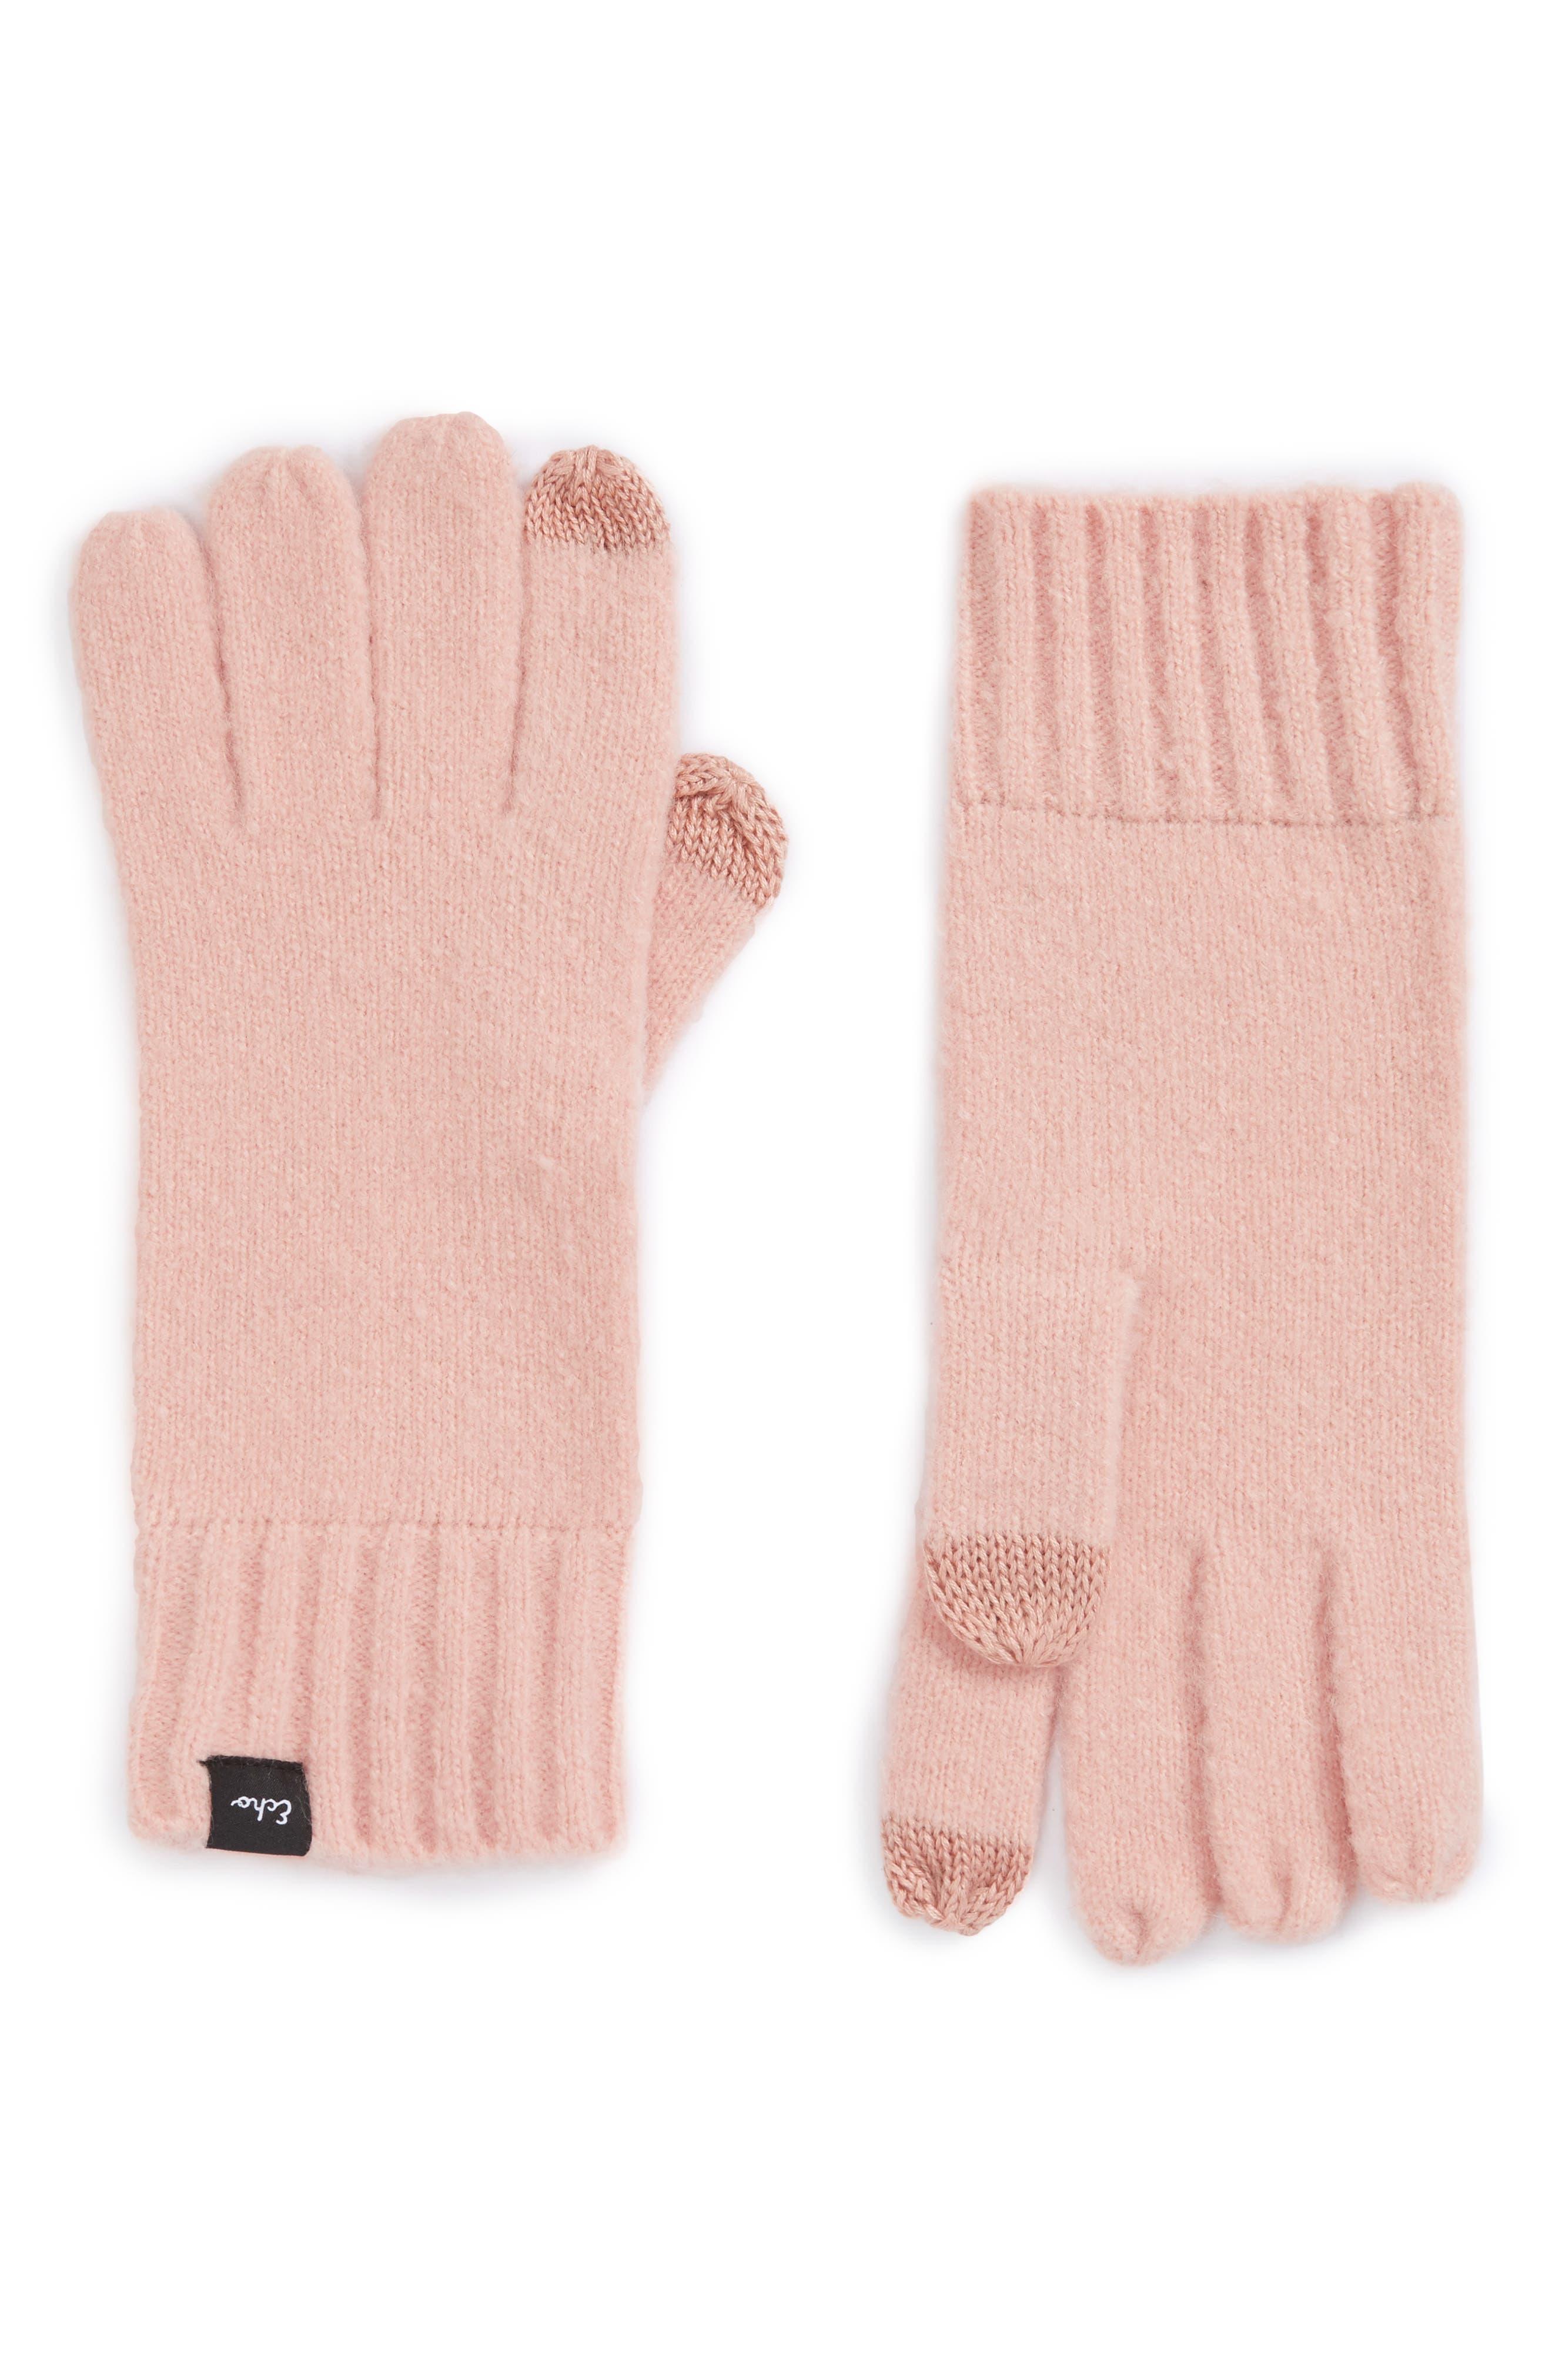 Echo 'Touch' Stretch Fleece Tech Gloves